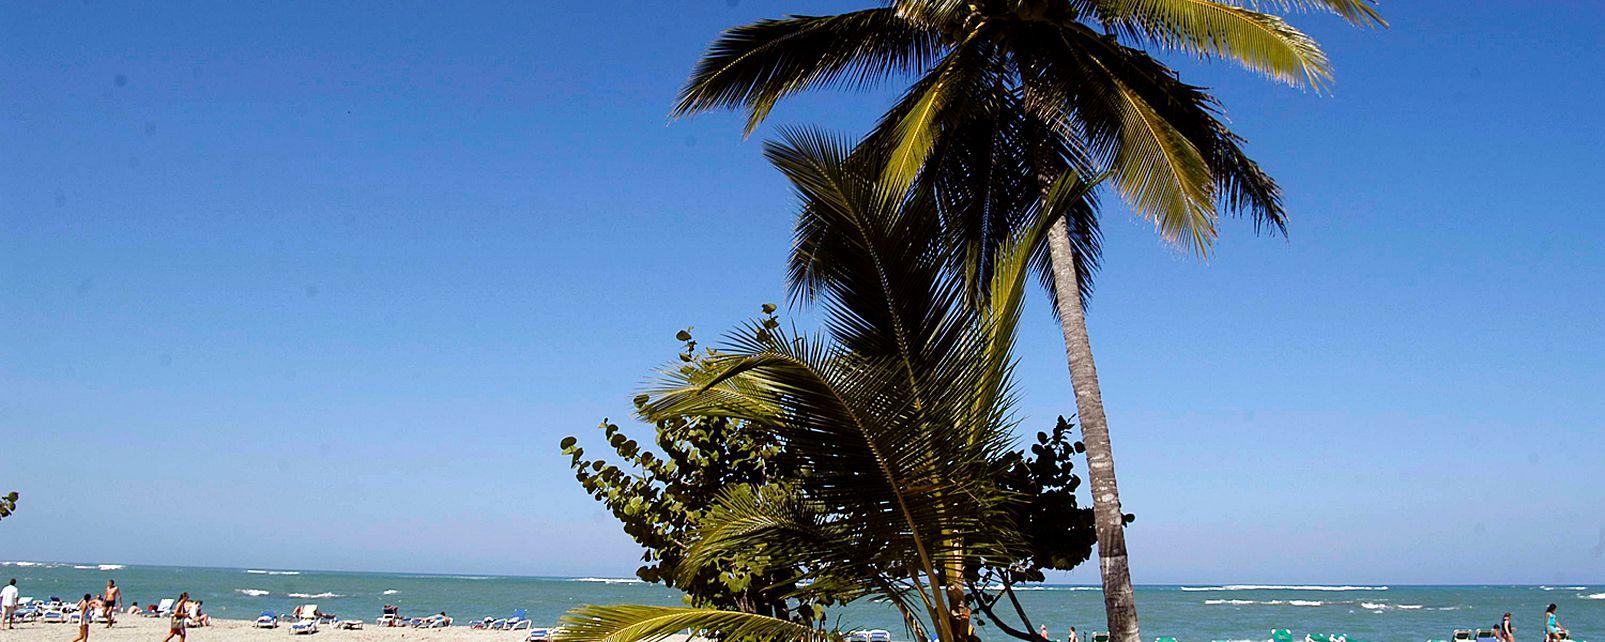 Hotel Tropical Playa Dorada